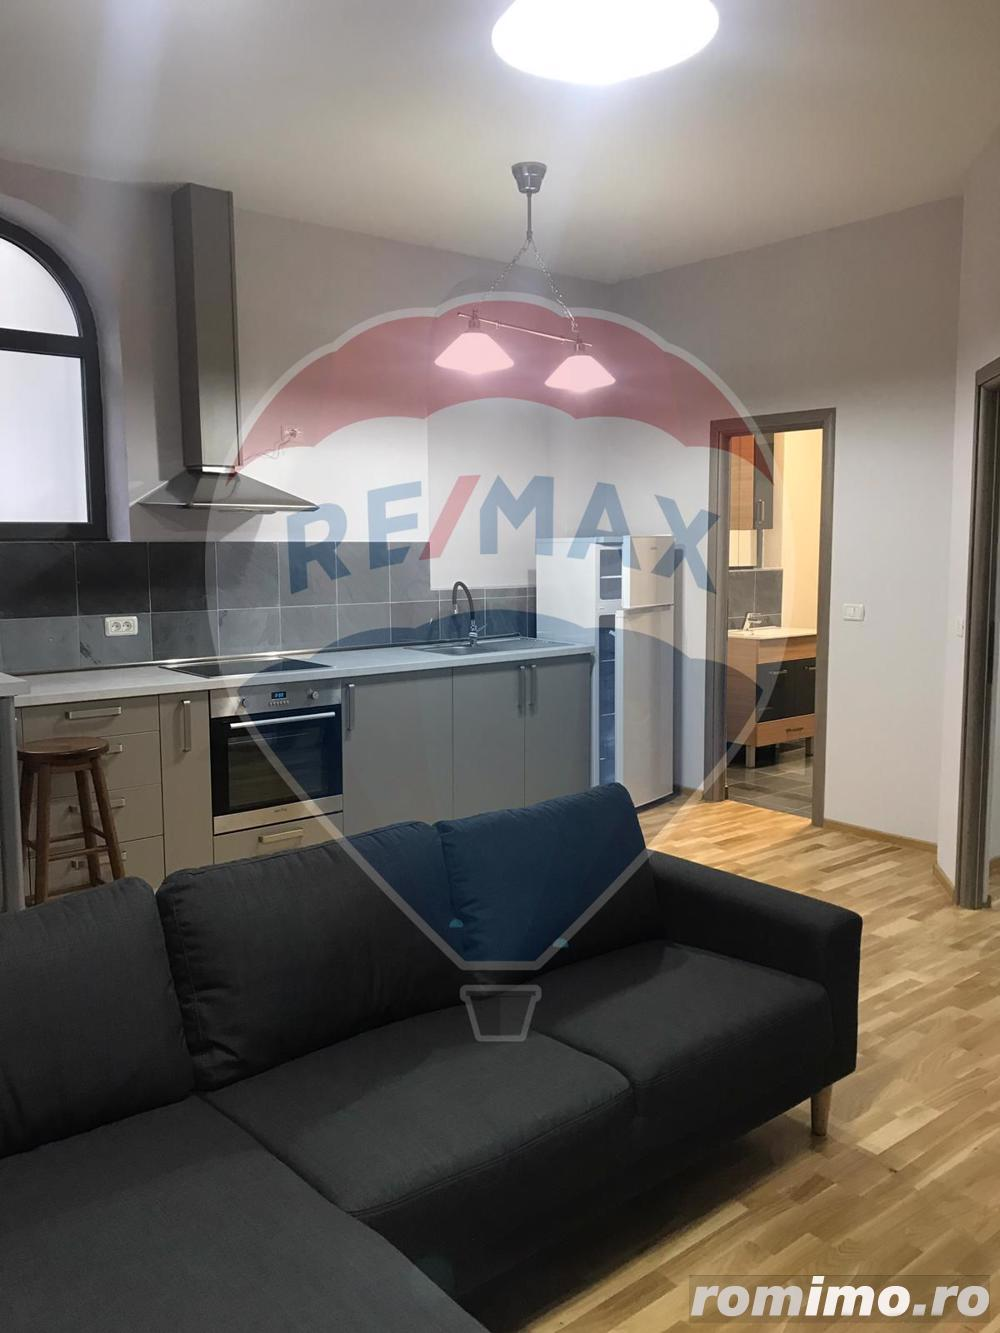 Apartament nou cu 2 camere zona Ultracentral